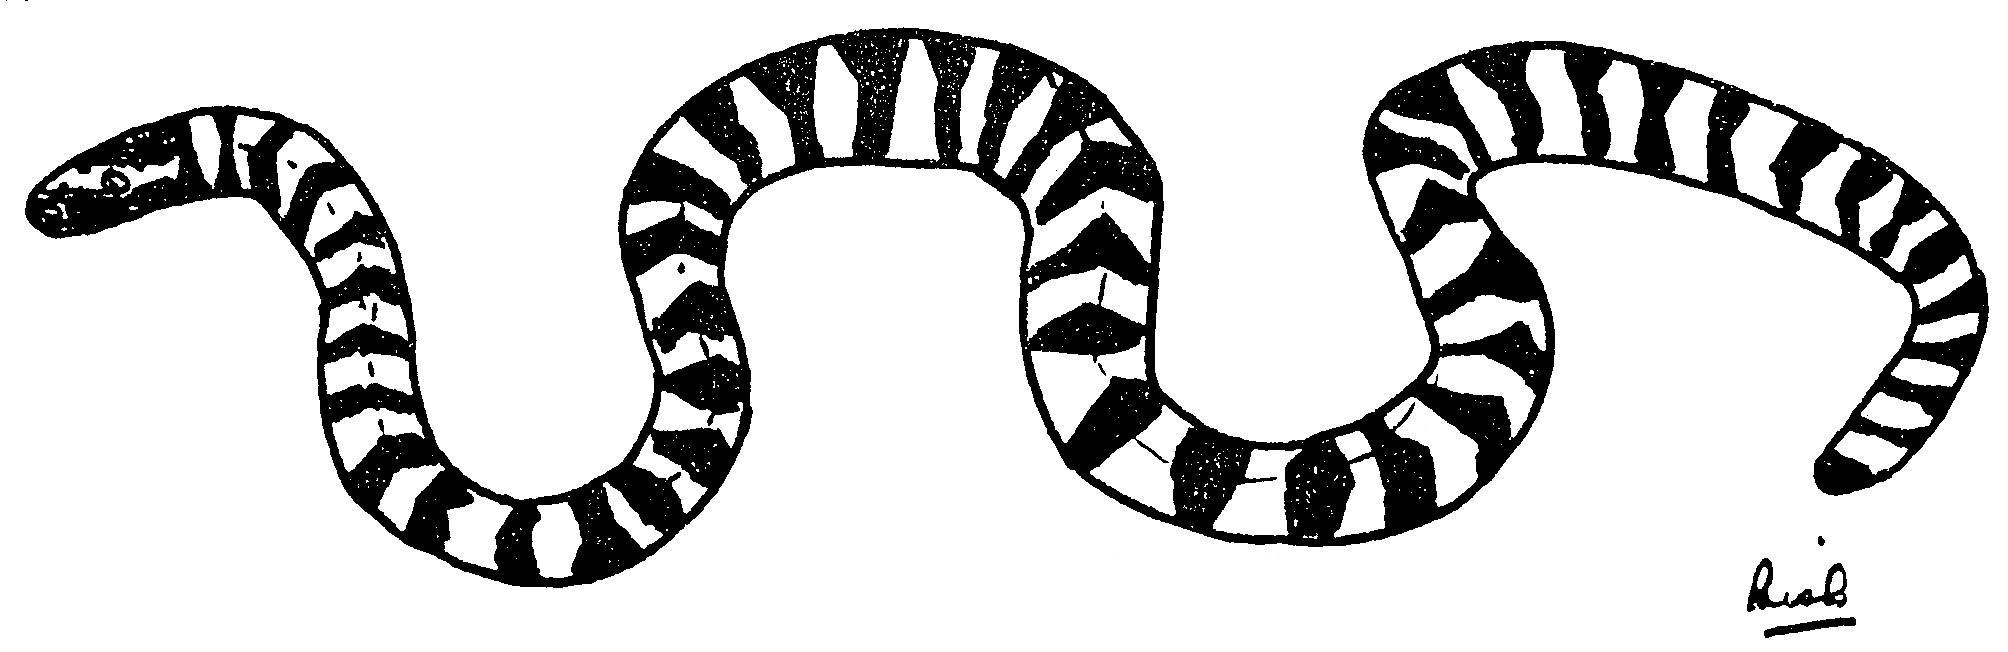 Drawn snake long snake Ali only whitish cm of